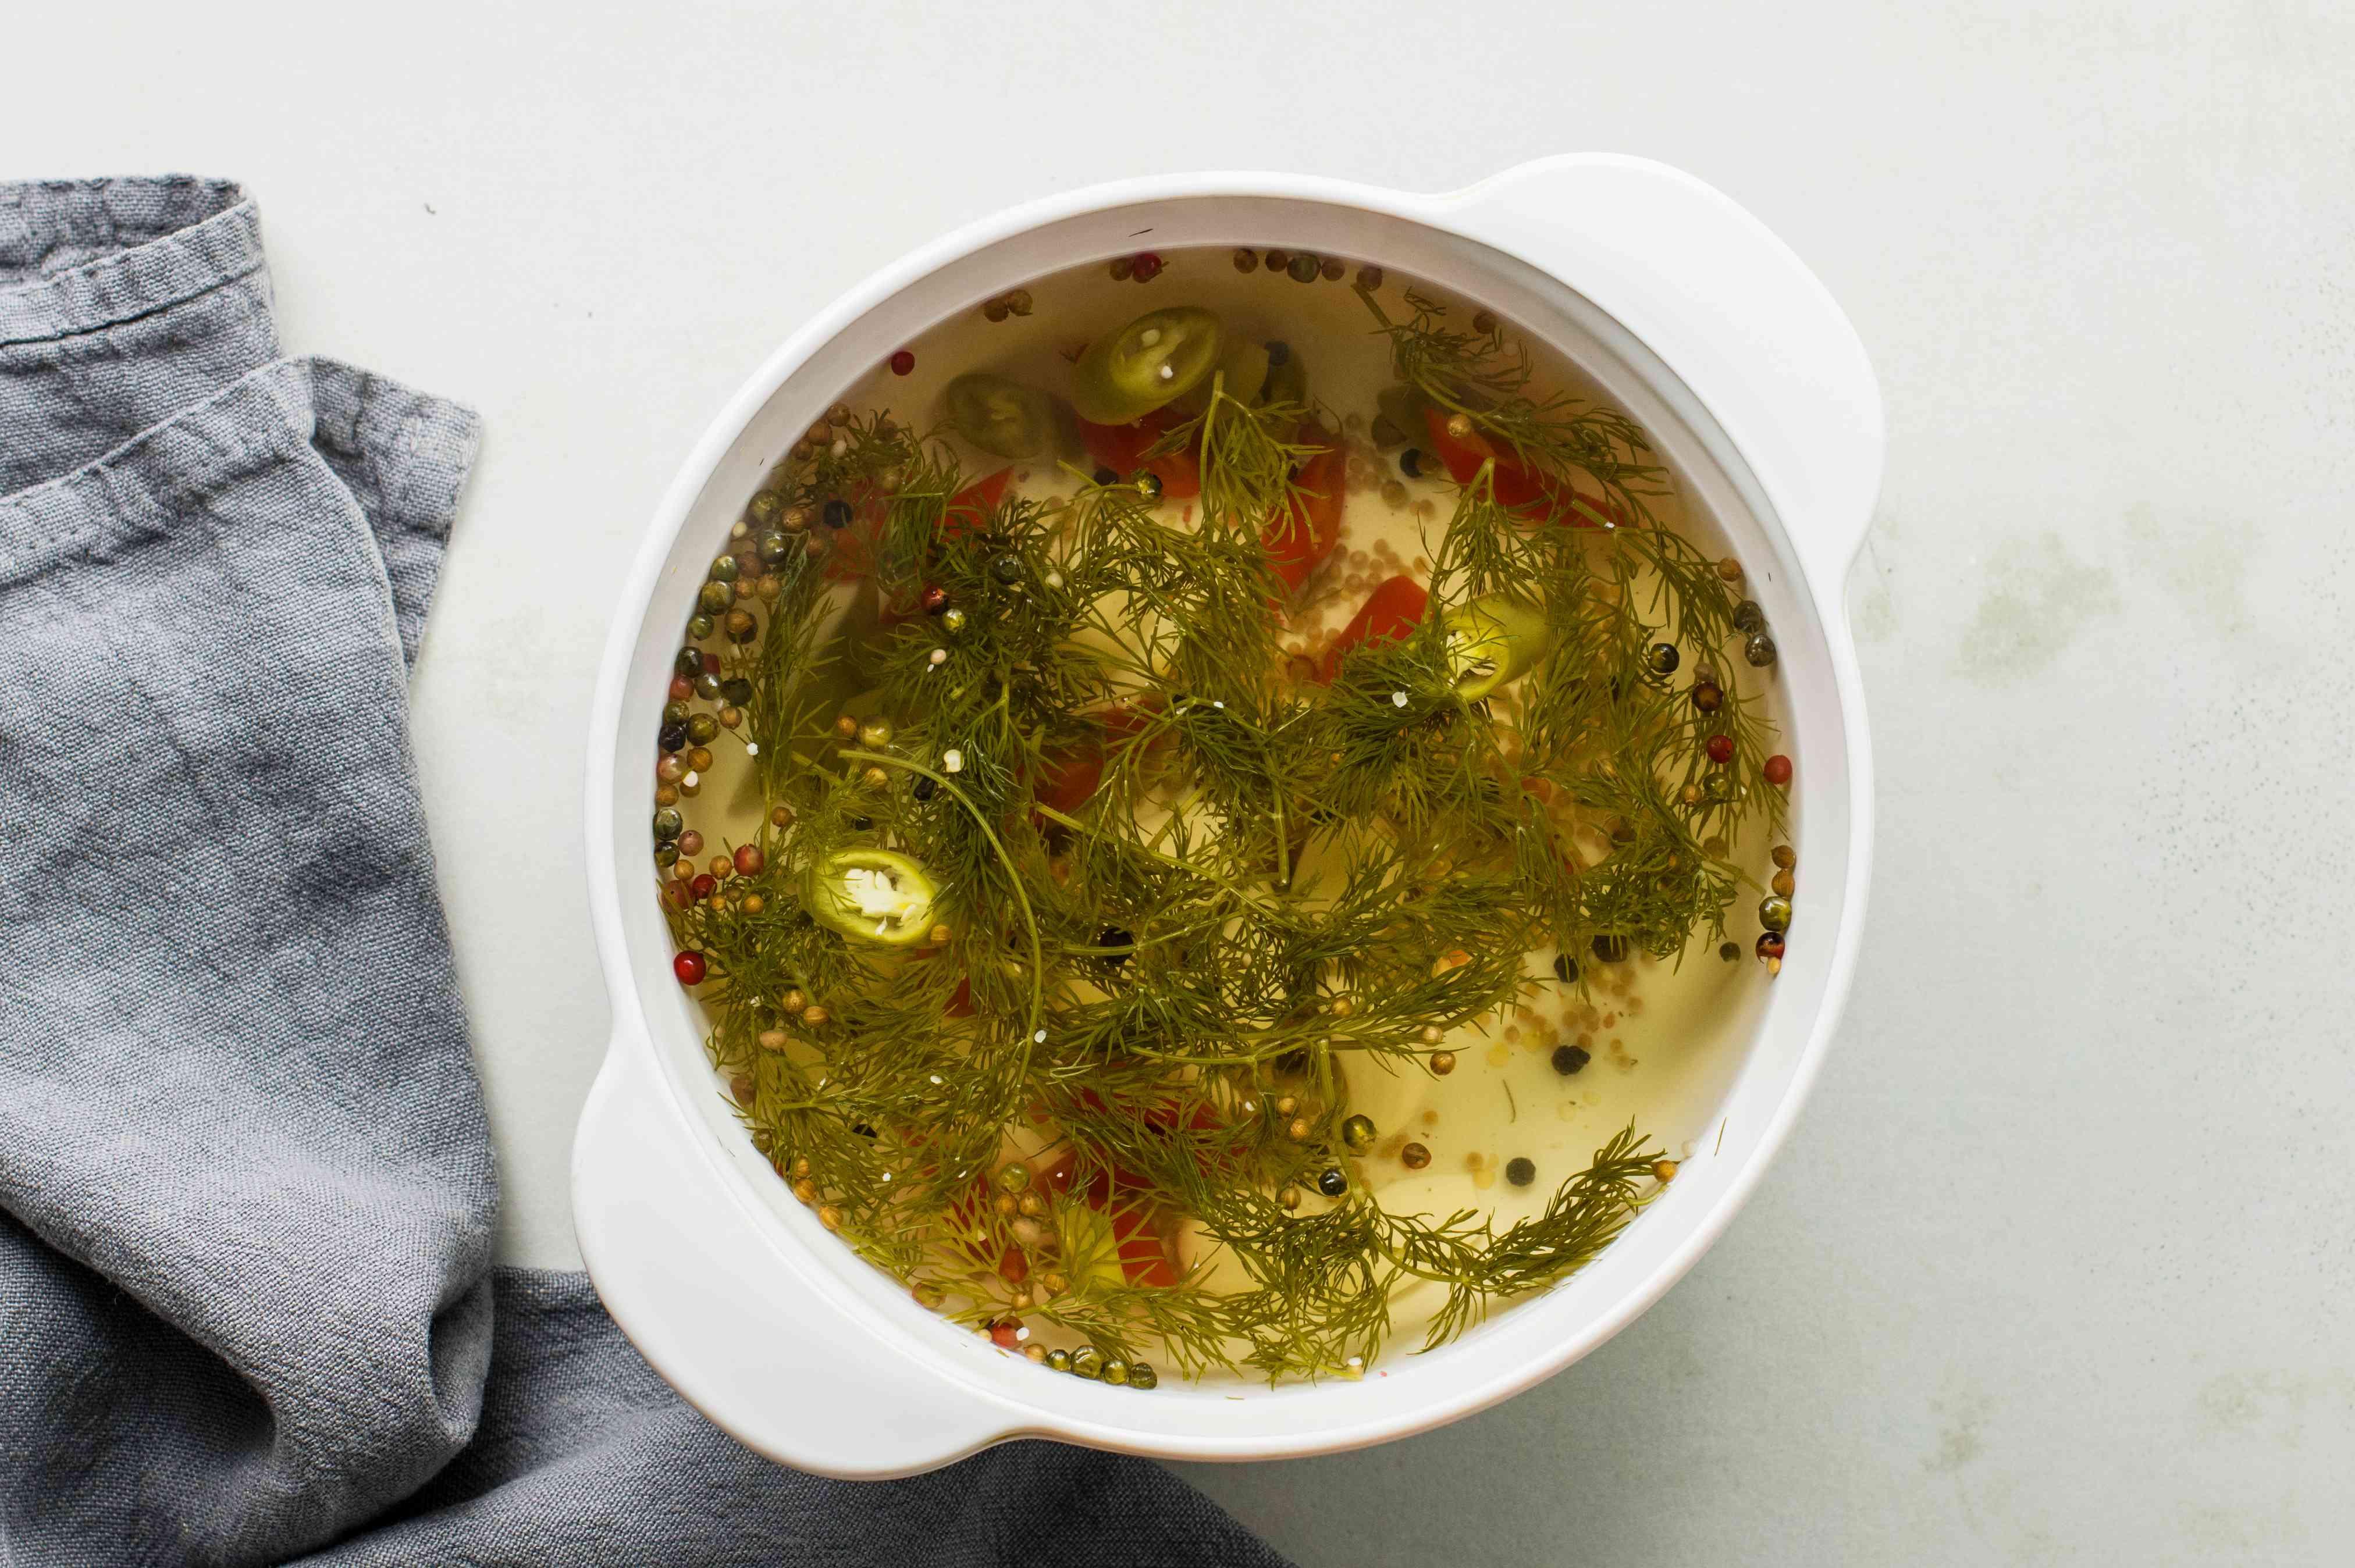 Combine vinegar, water, salt, sugar, and seasonings in pot